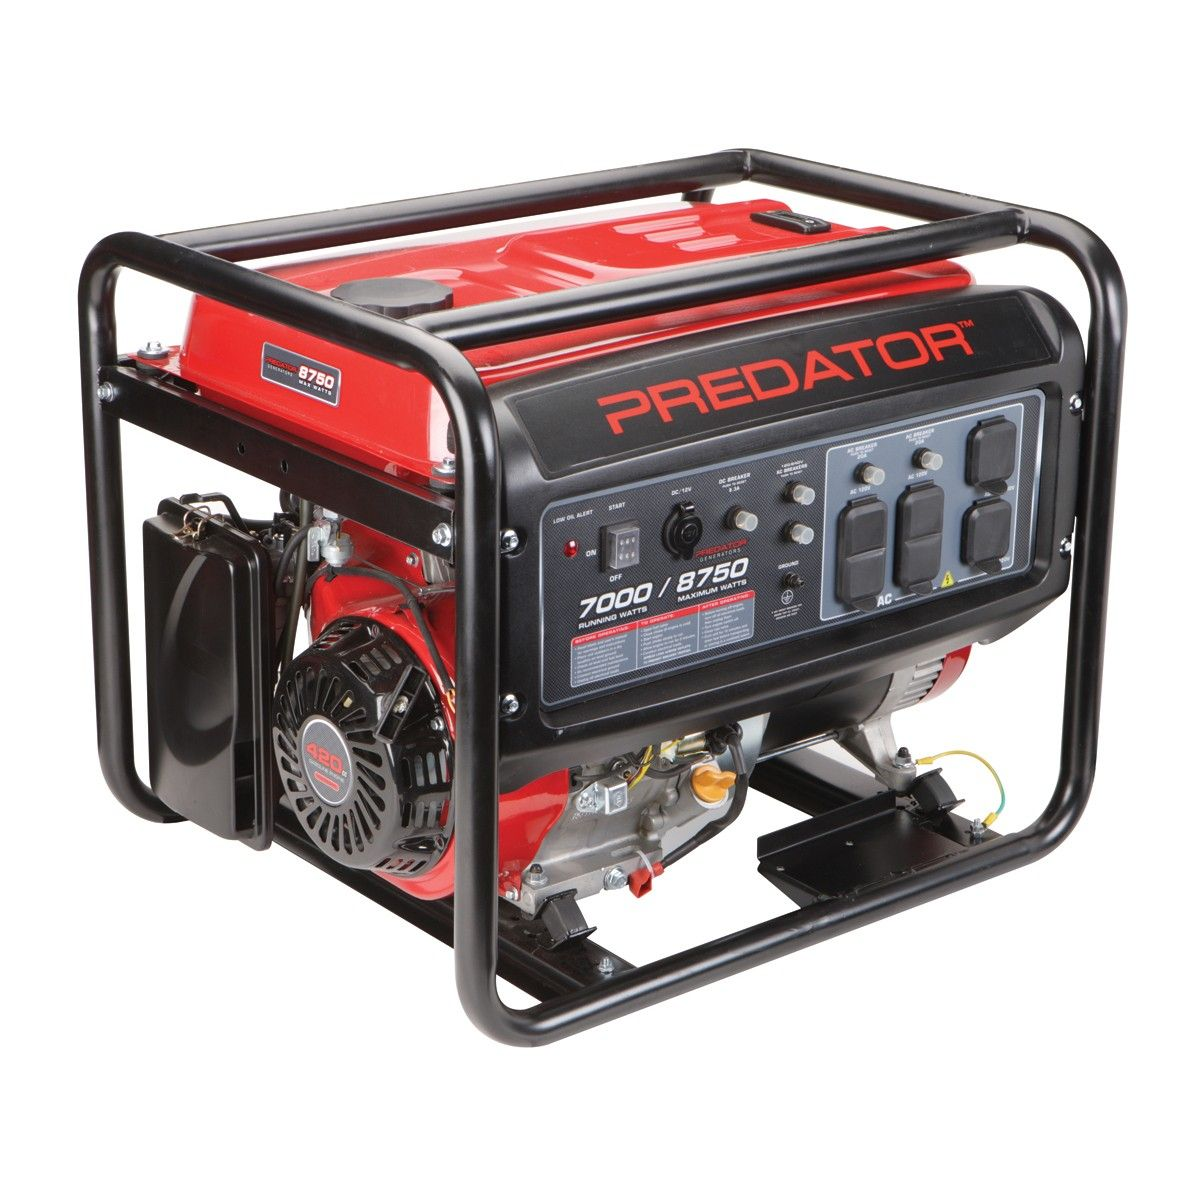 hight resolution of 420cc 8750 watts max 7000 watts rated portable generator